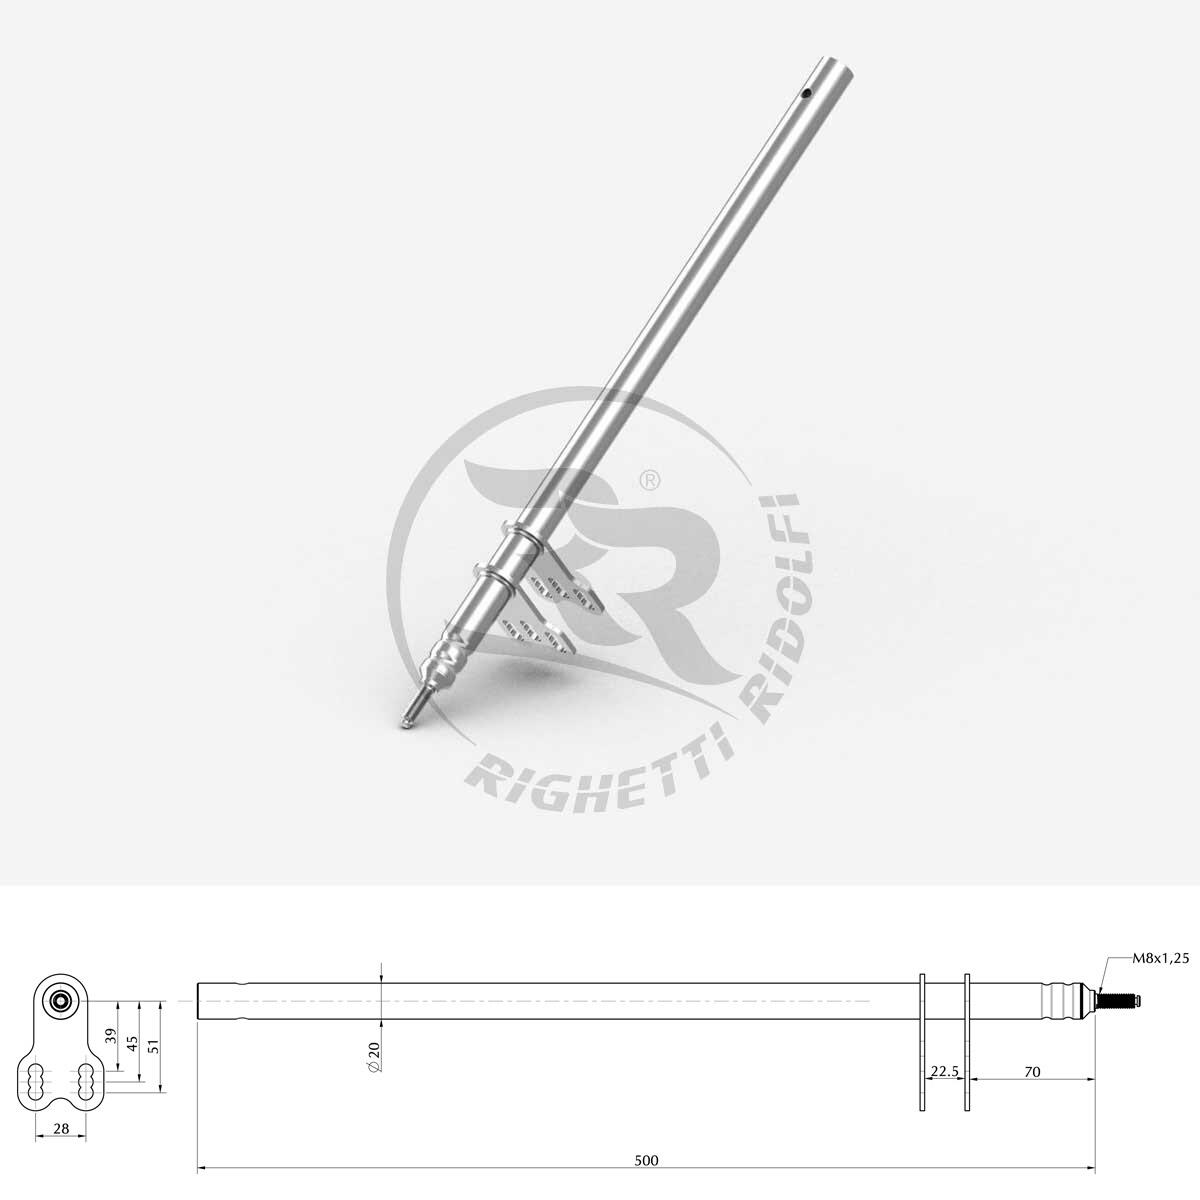 ART / Birel Steering Shaft - Righetti